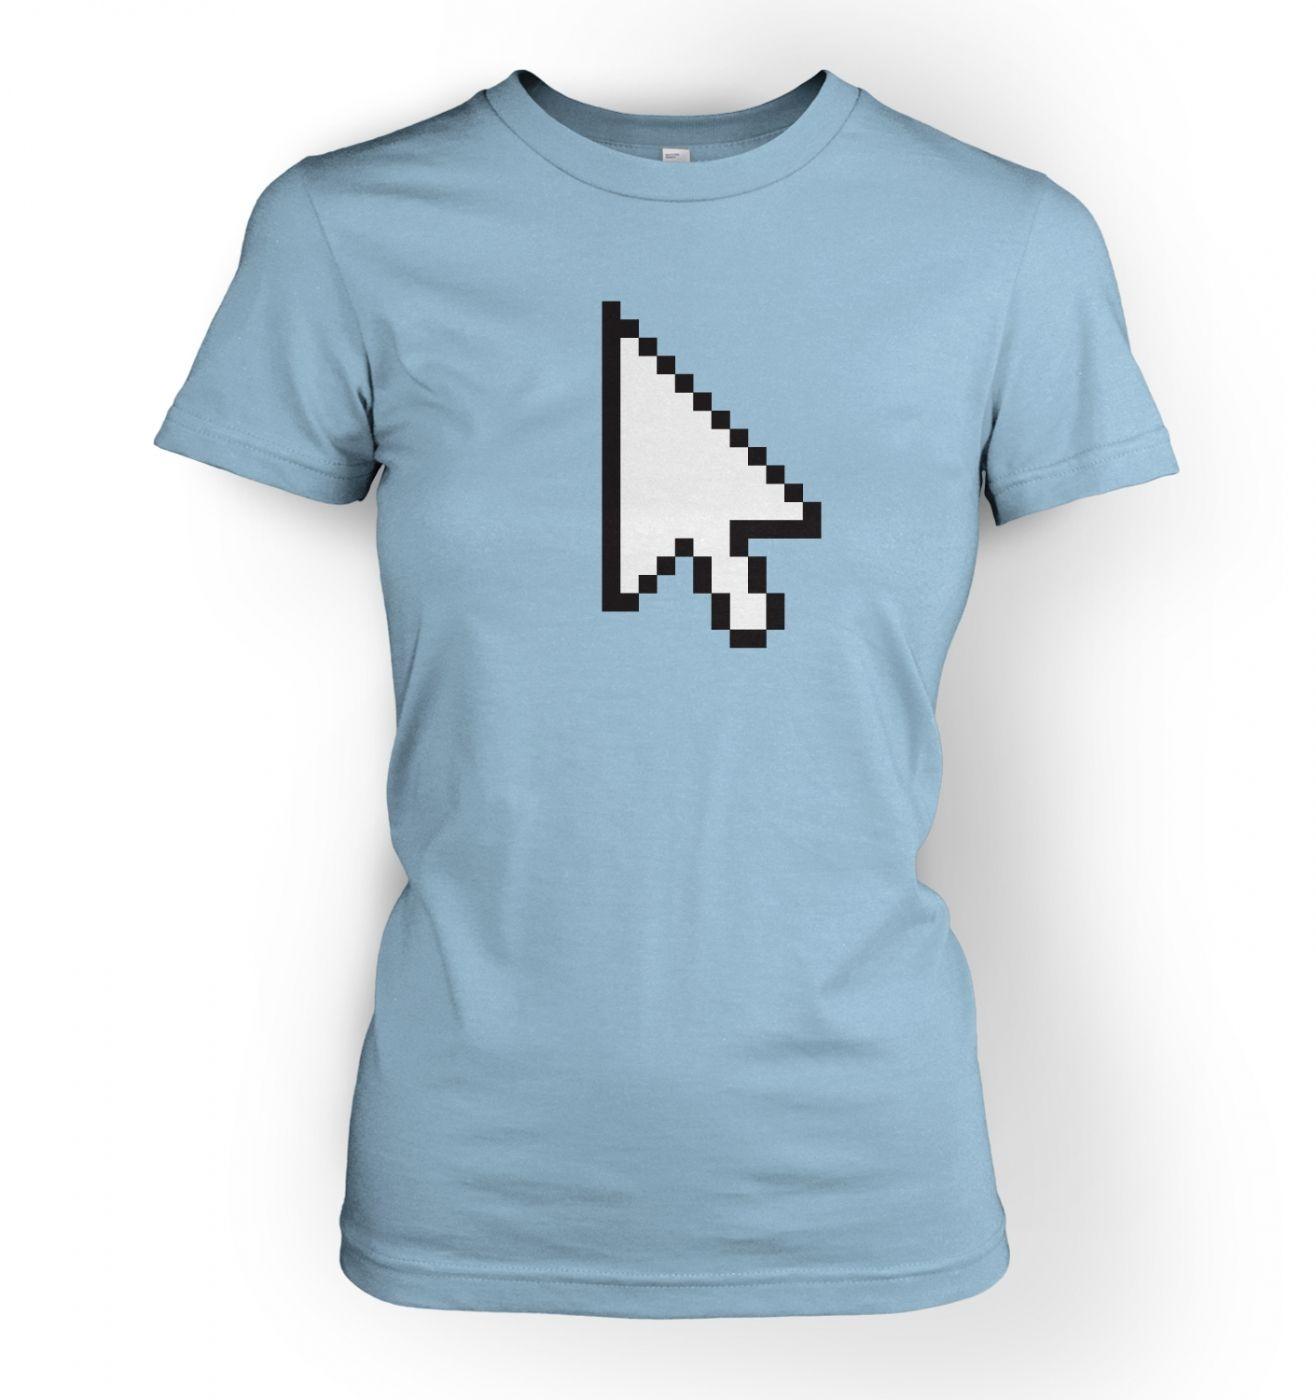 Women's Pixelated Cursor t-shirt